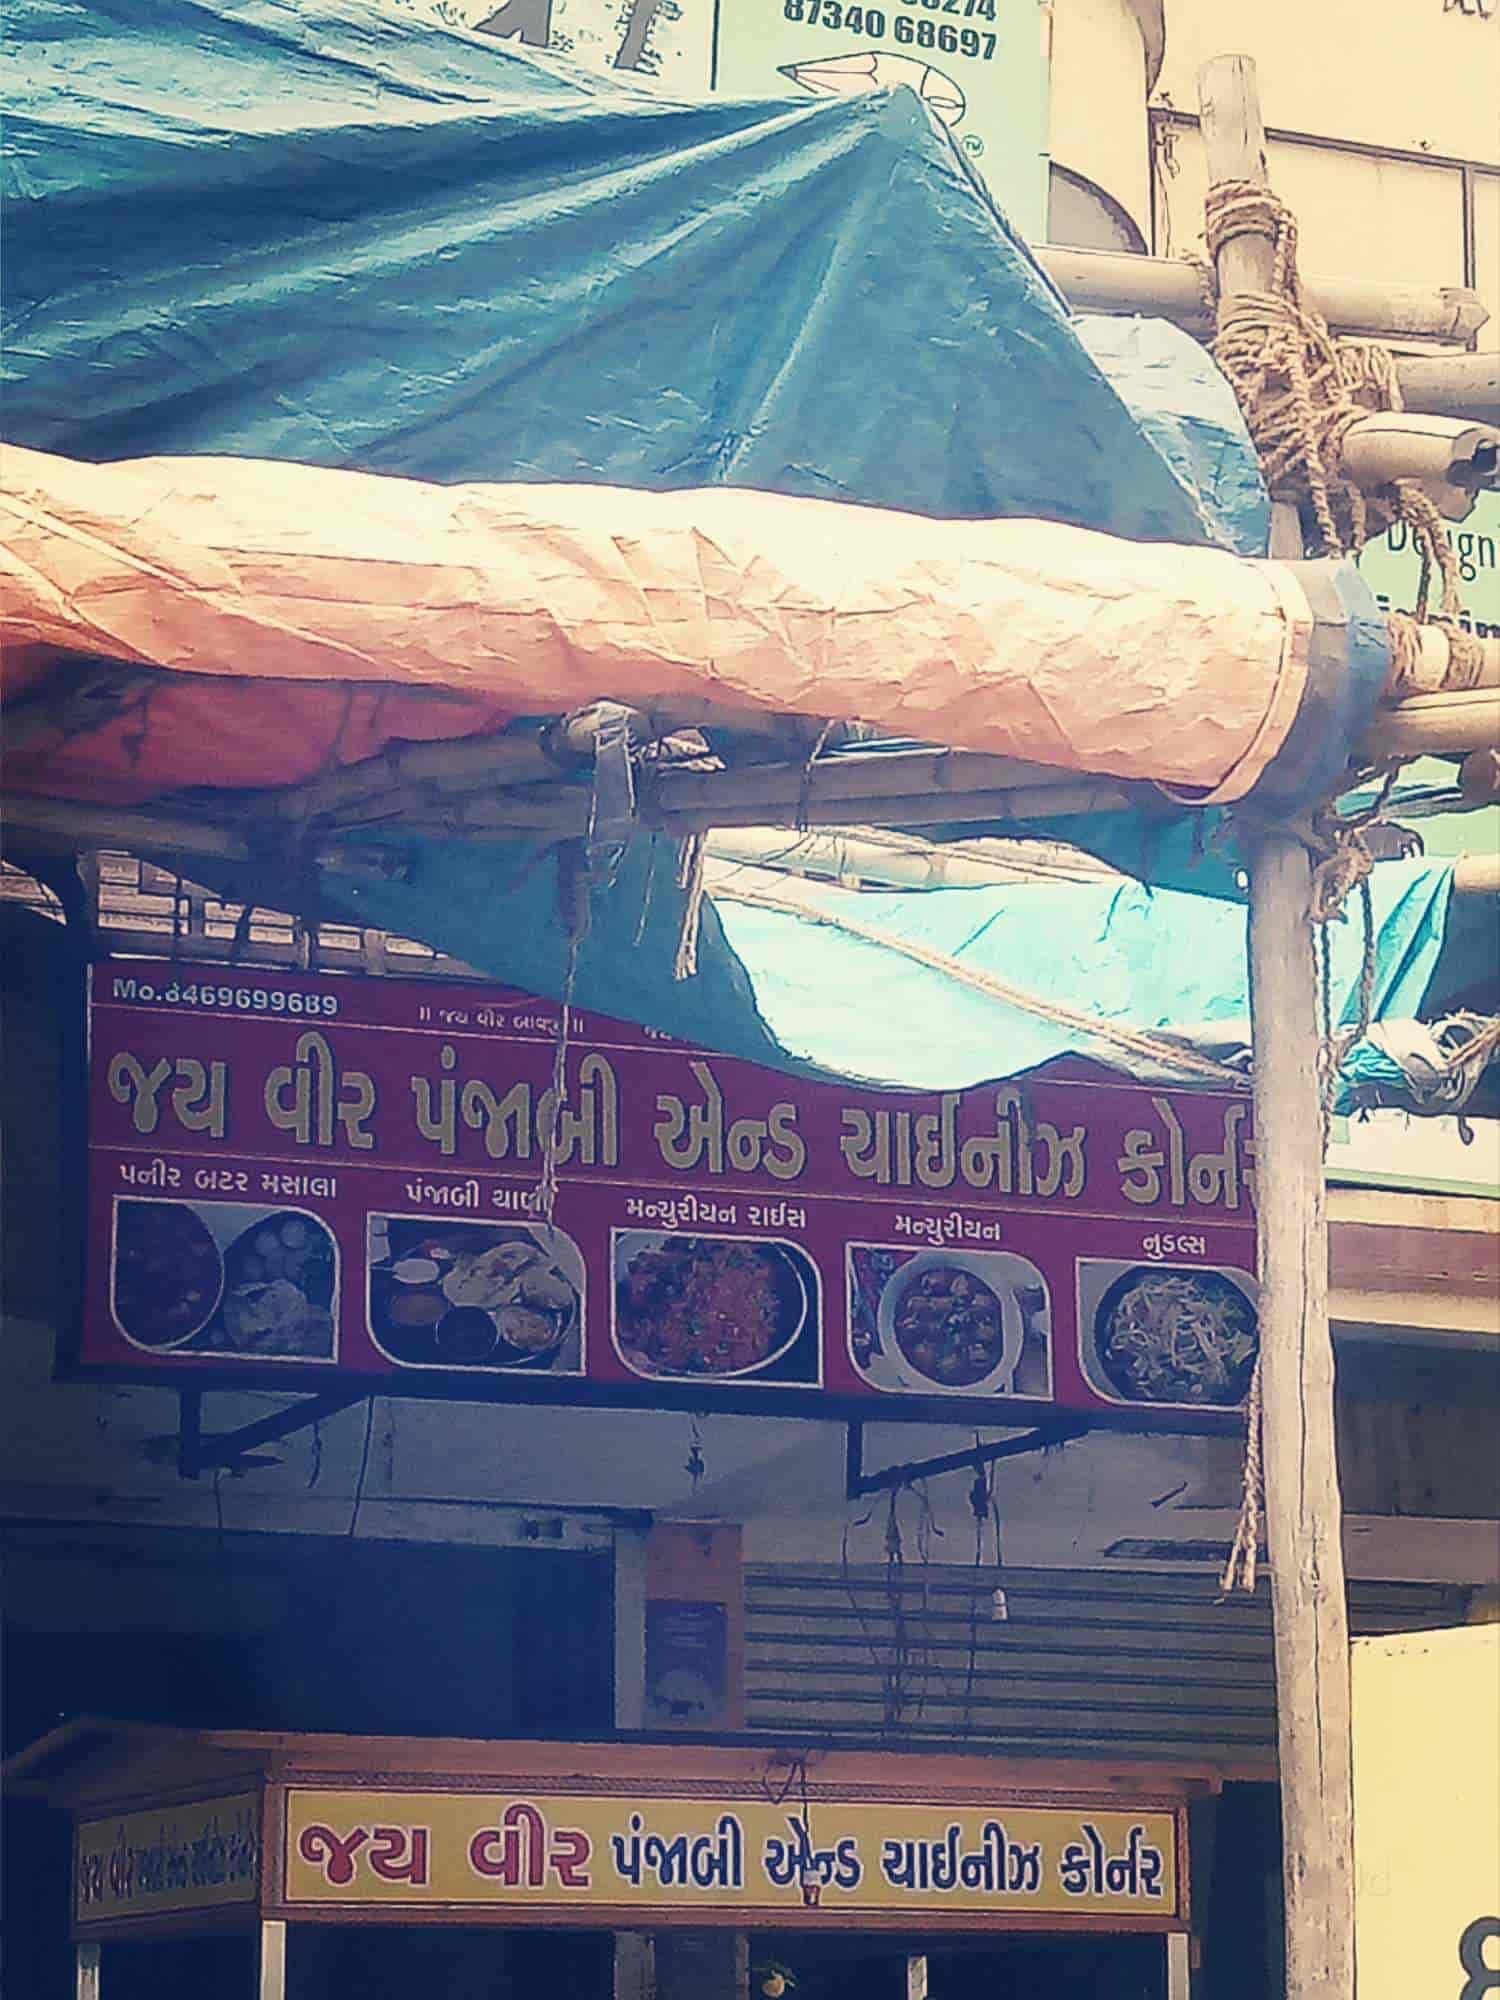 Jay Veer Punjabi & Chinese Corner, Maninagar, Ahmedabad